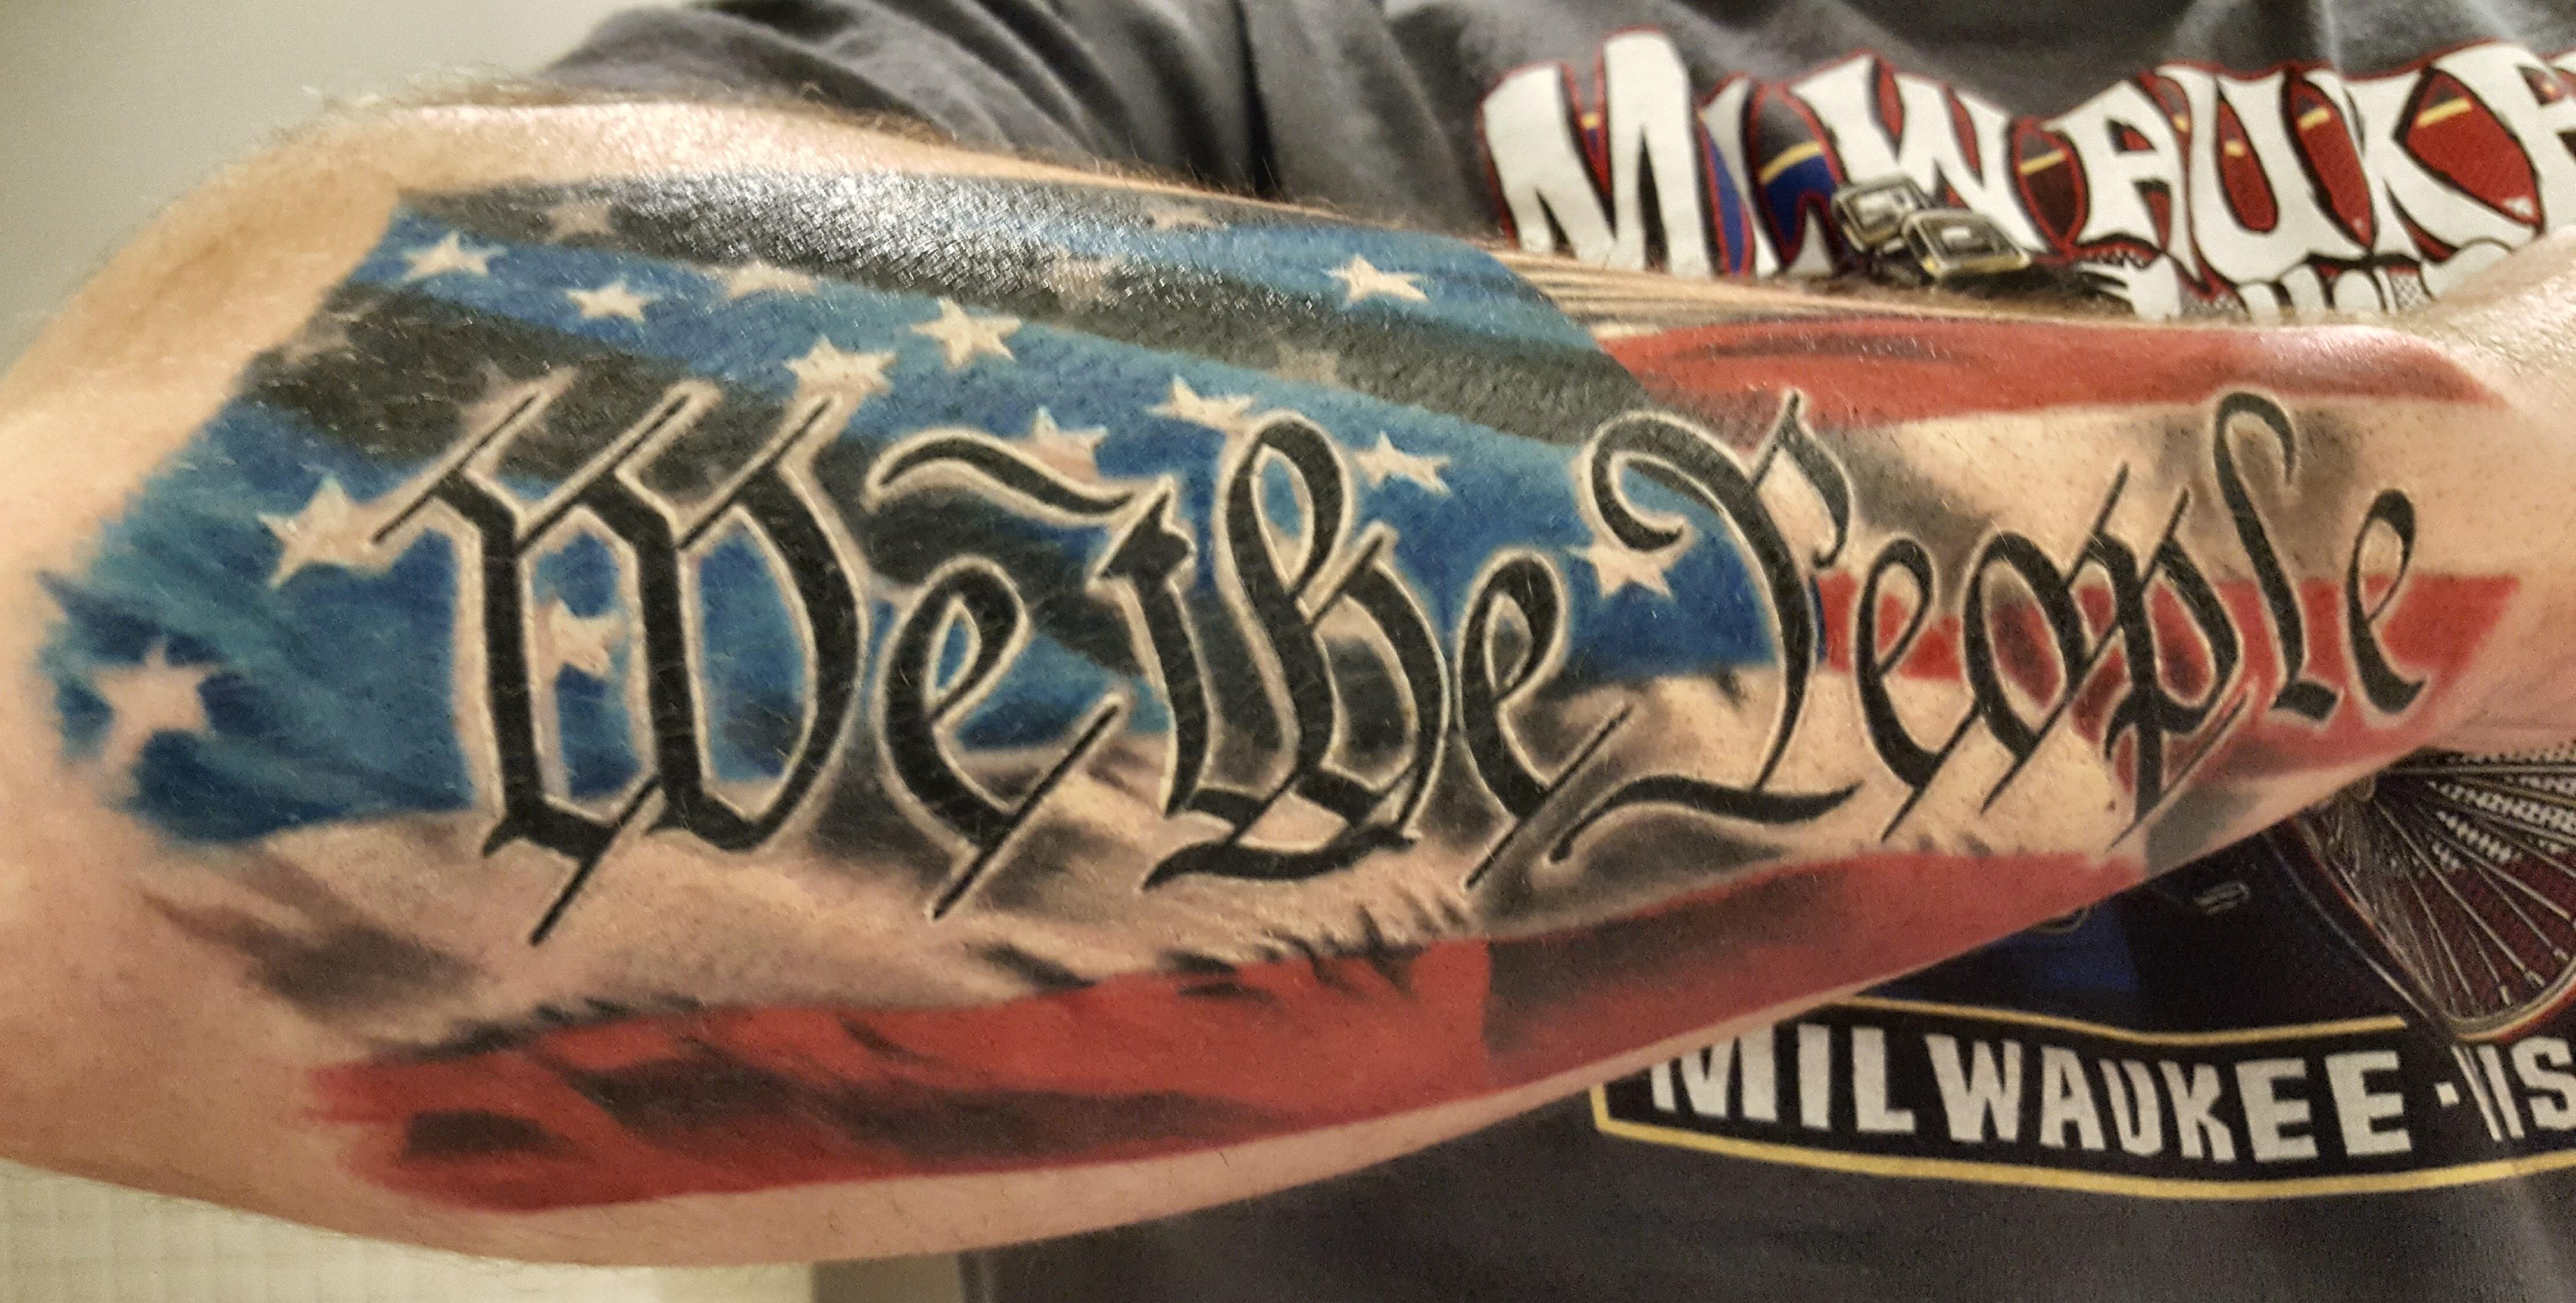 we the people tattoo.jpg